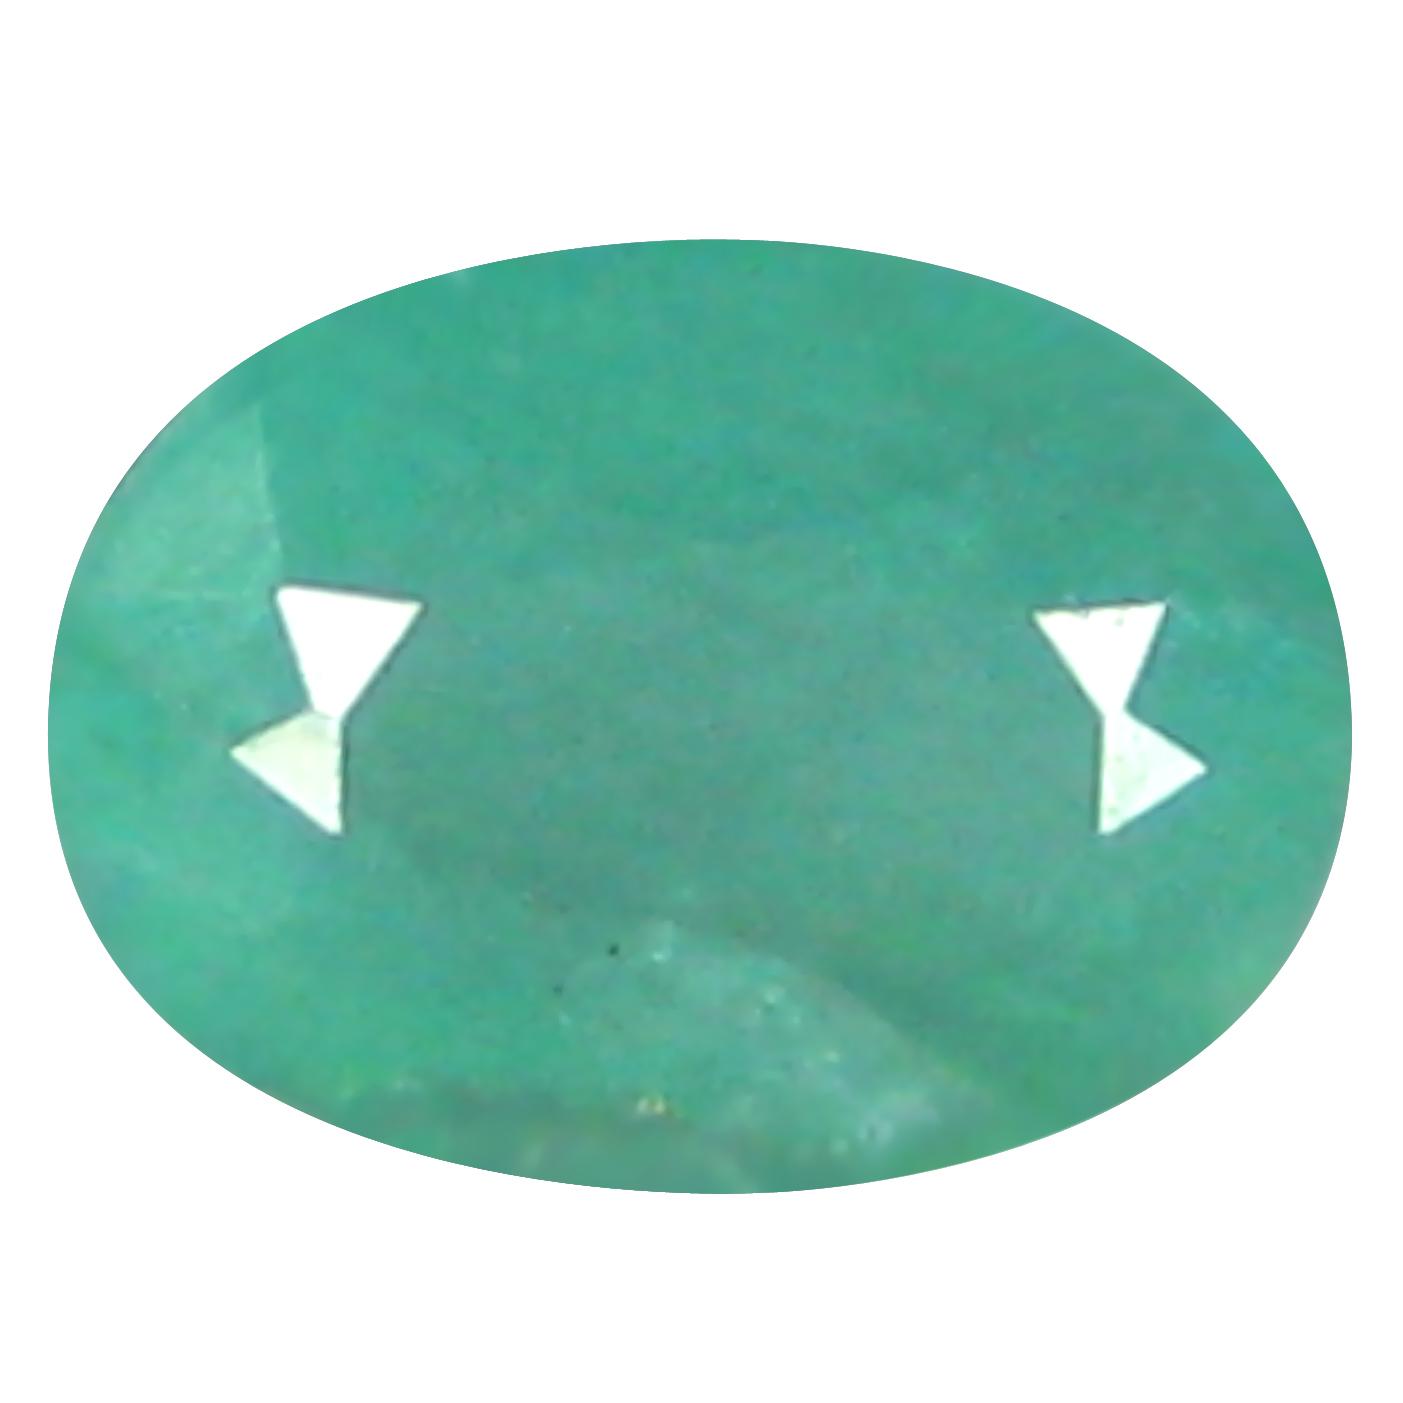 0.26 ct  First-class Oval Shape (5 x 4 mm) Bluish Green Grandidierite Natural Gemstone